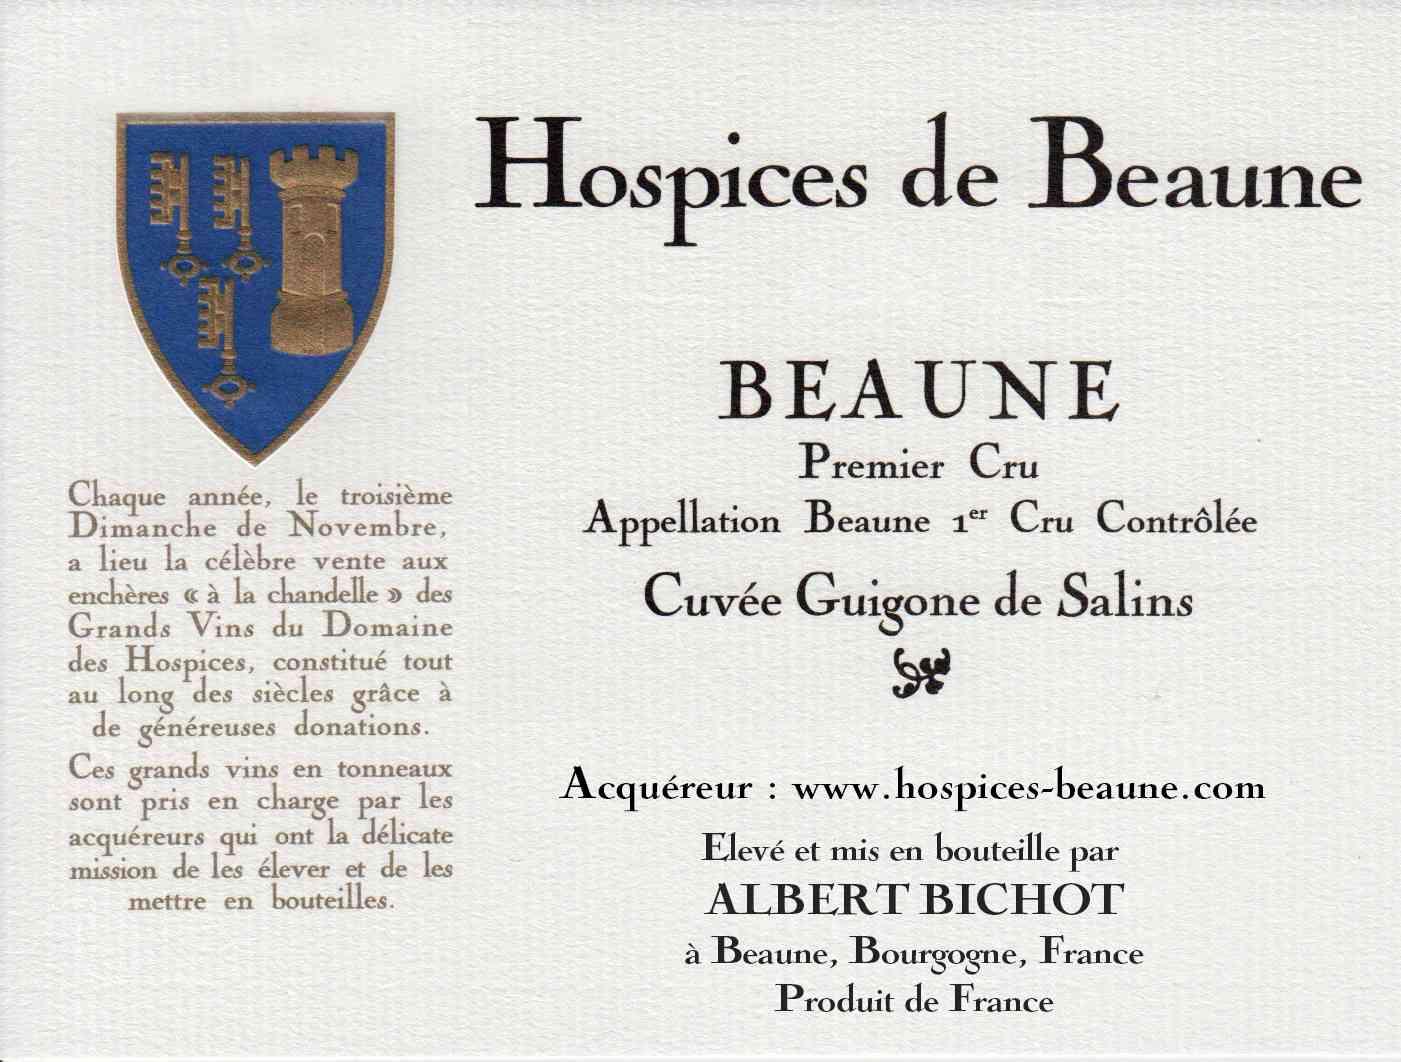 Encheres-auction-HospicesdeBeaune-AlbertBichot-Beaune1erCru-Cuvee-GuigonedeSalins